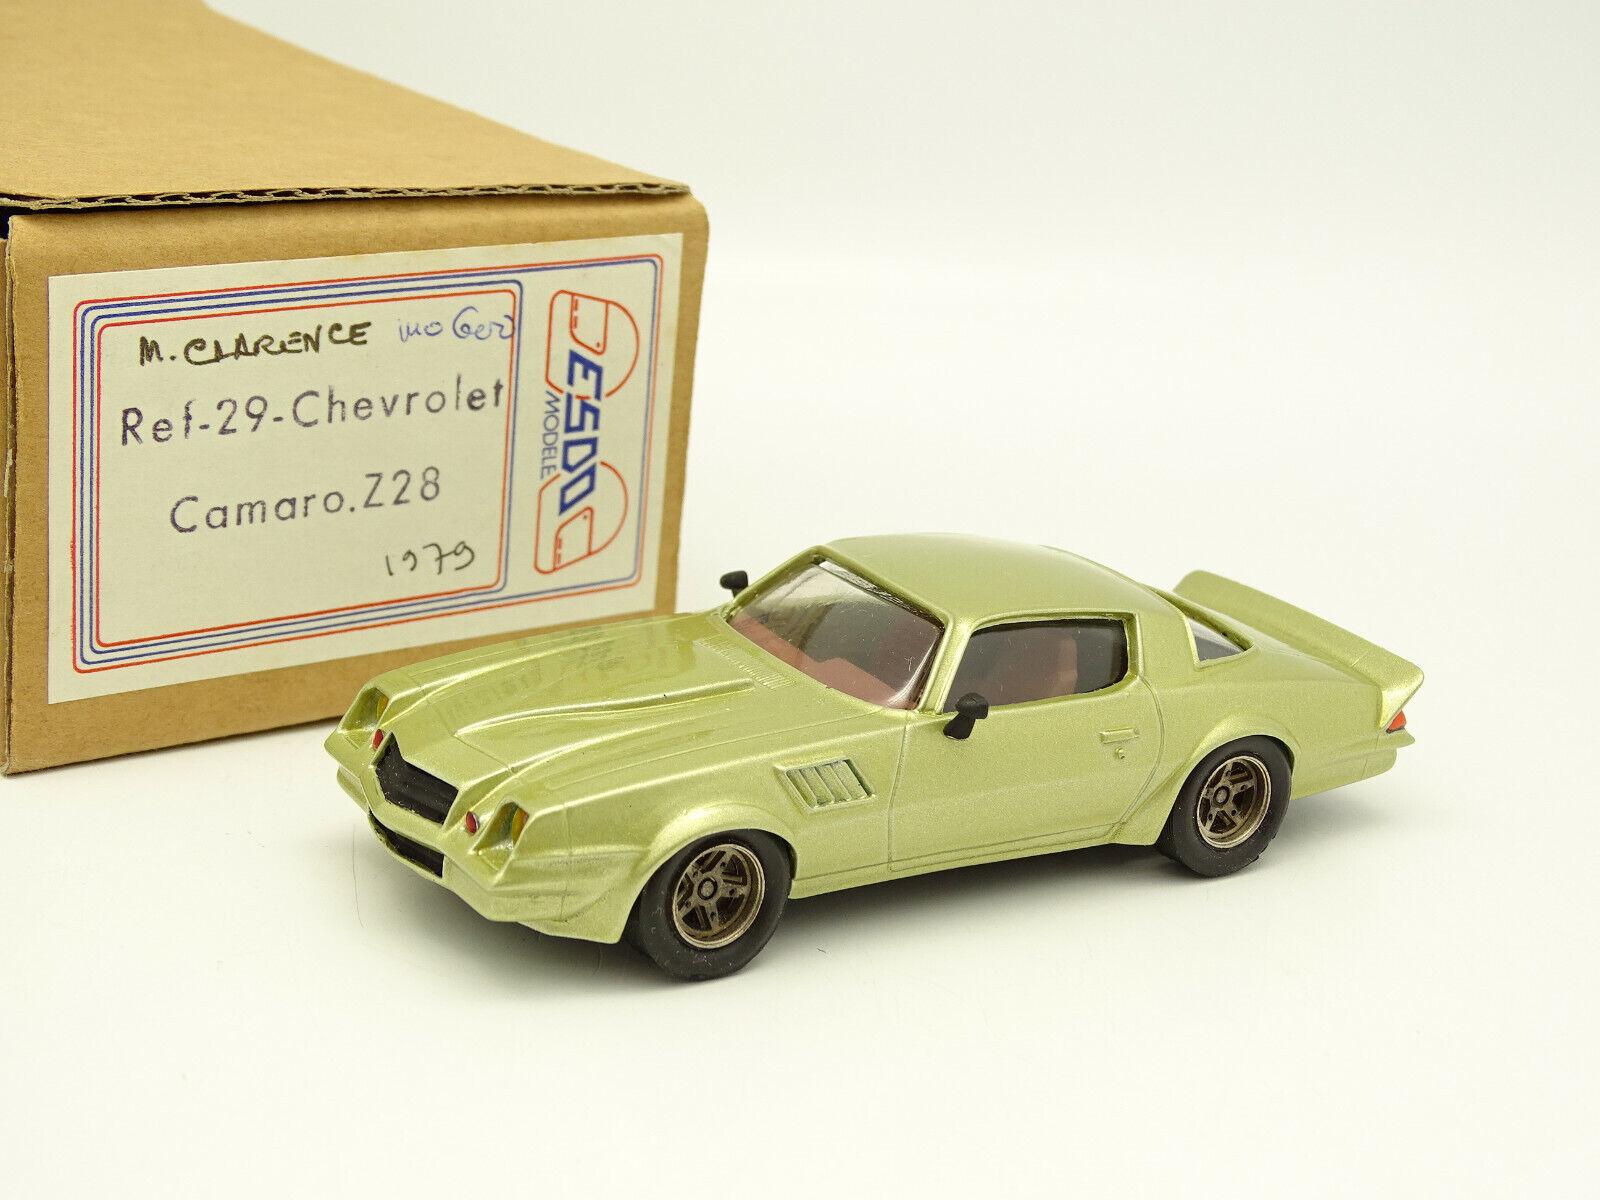 Esdo Kit Assembled Resin 1 43 - Chevrolet Camaro Z28 Green